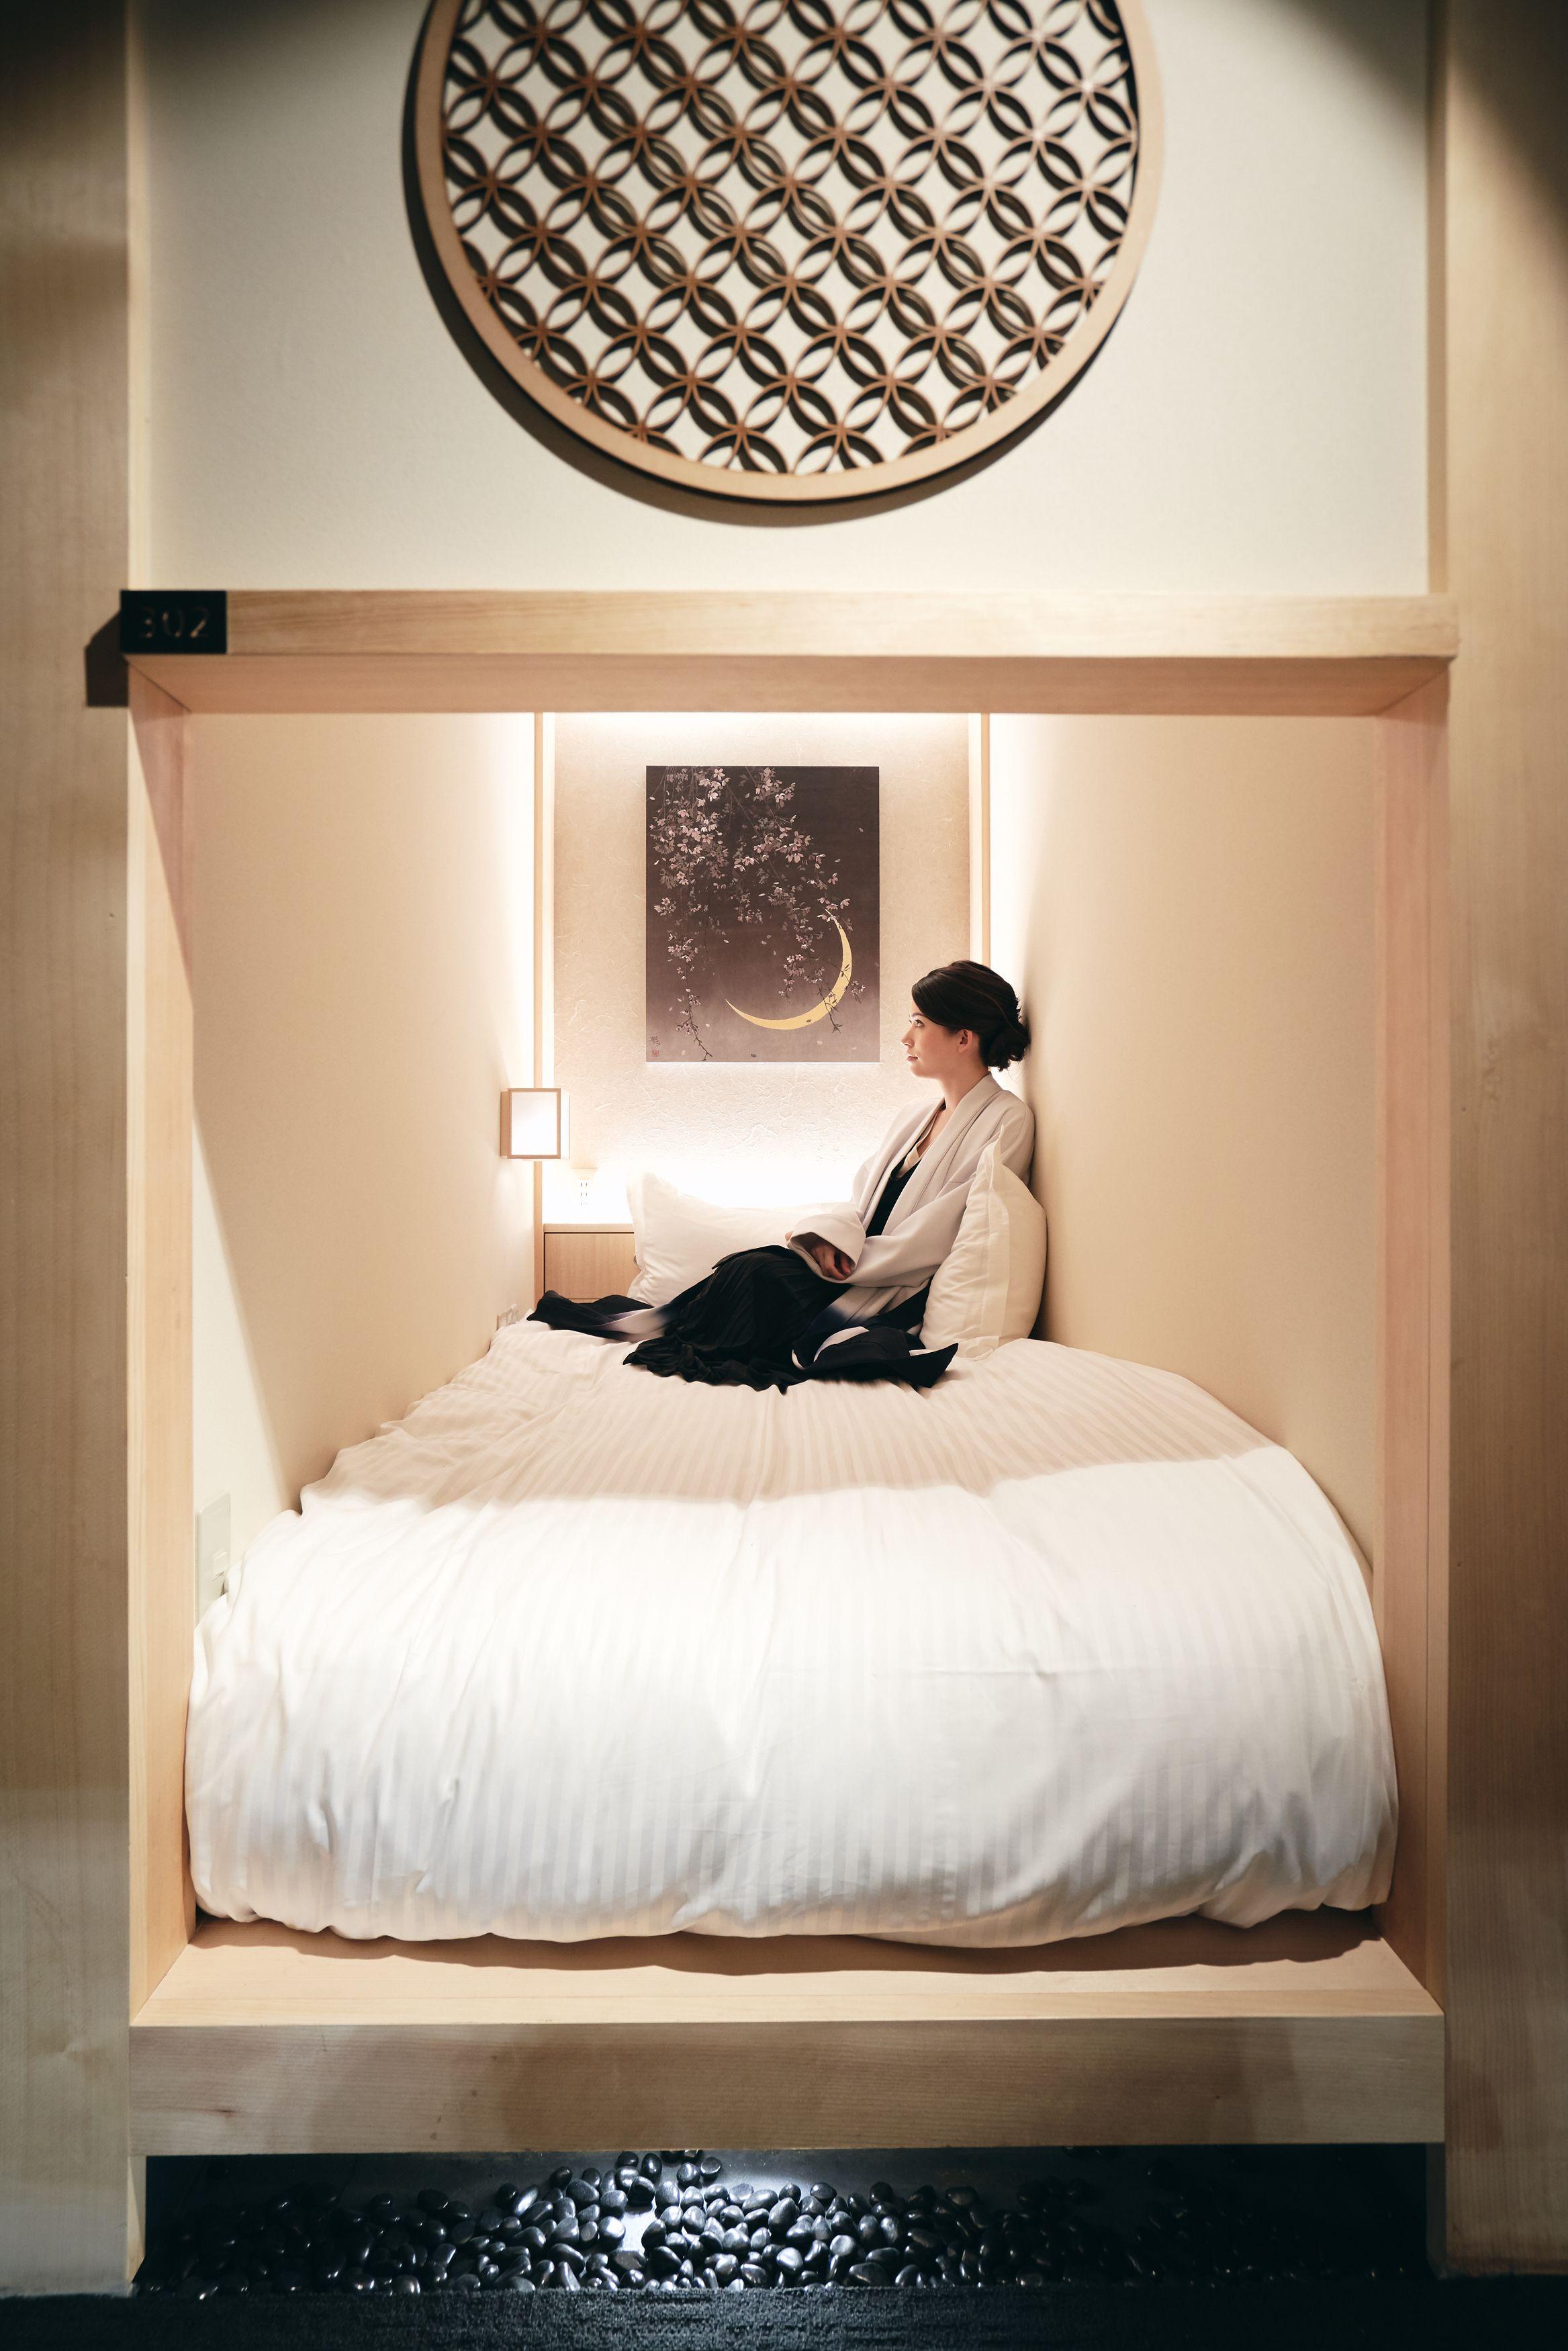 Unique Capsule Hotel In Tokyo Capsule Hotel Hotel Bedroom Design Small Guest Rooms